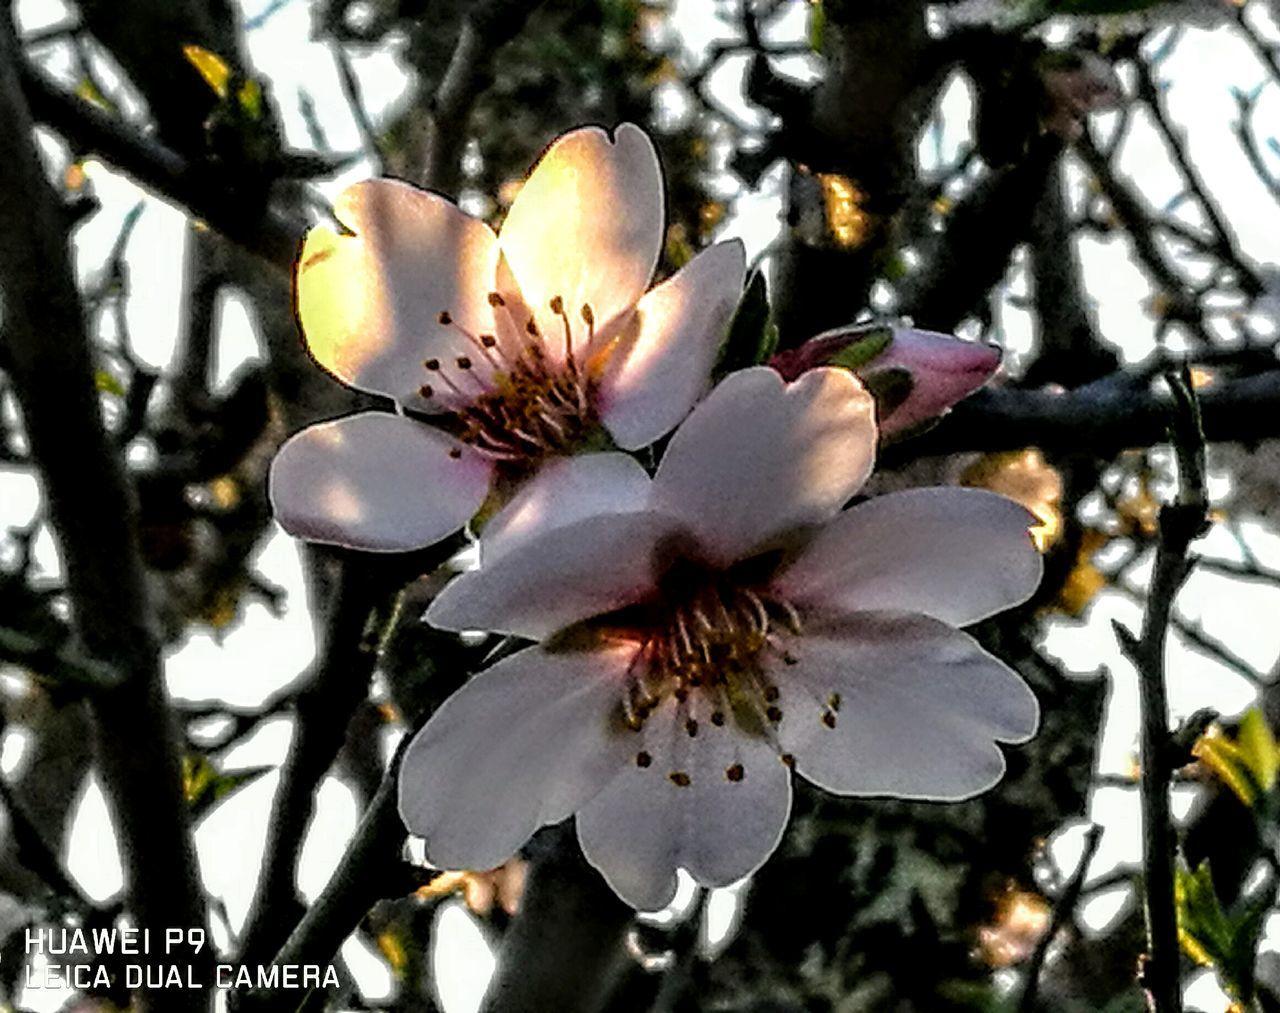 Mandelblüte auf Mallorca... Growth Beauty In Nature Nature Flower Plant Outdoors Freshness Tree Originalpicture GetbetterwithAlex PalmaDiMaiorca Blossom Nostalgic Scene Tranquil Scene